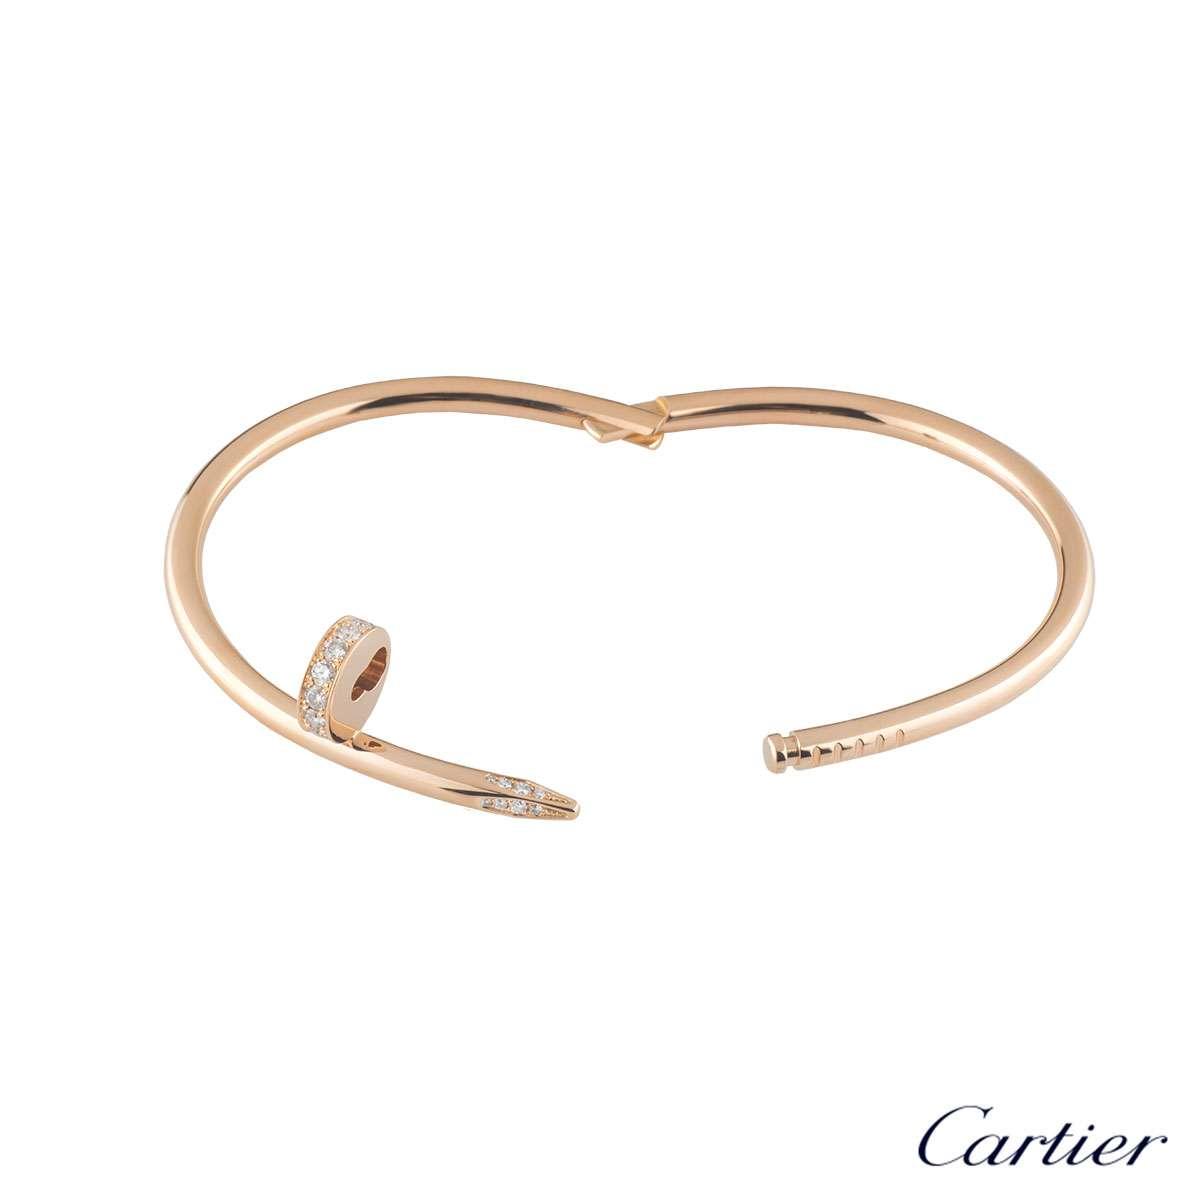 Cartier Rose Gold Diamond Juste Un Clou Bracelet Size 16 B6039016